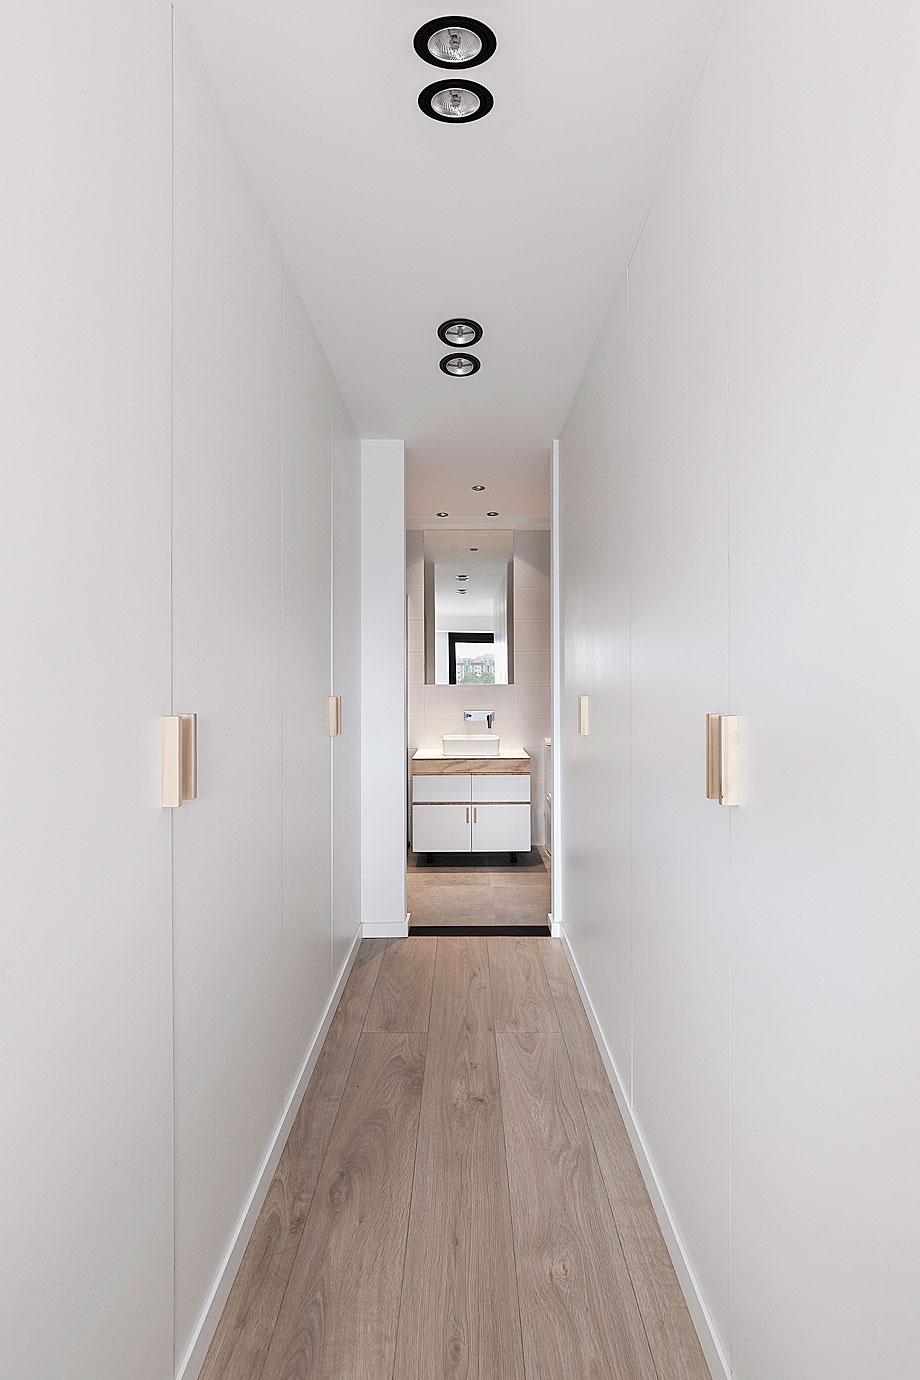 vivienda-nan-arquitectos-13